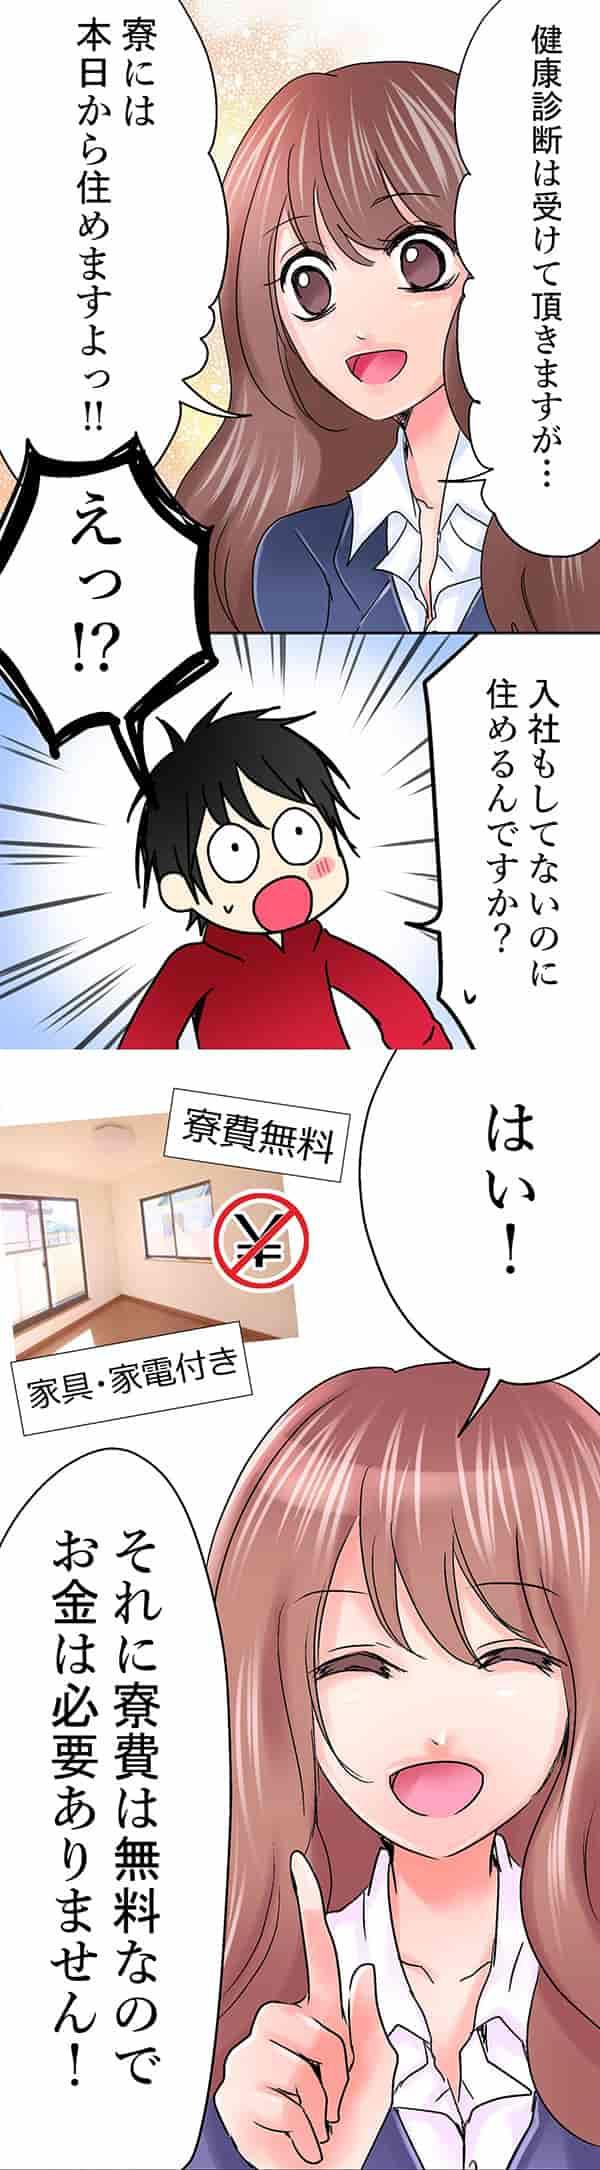 nikko_cm12A.jpg